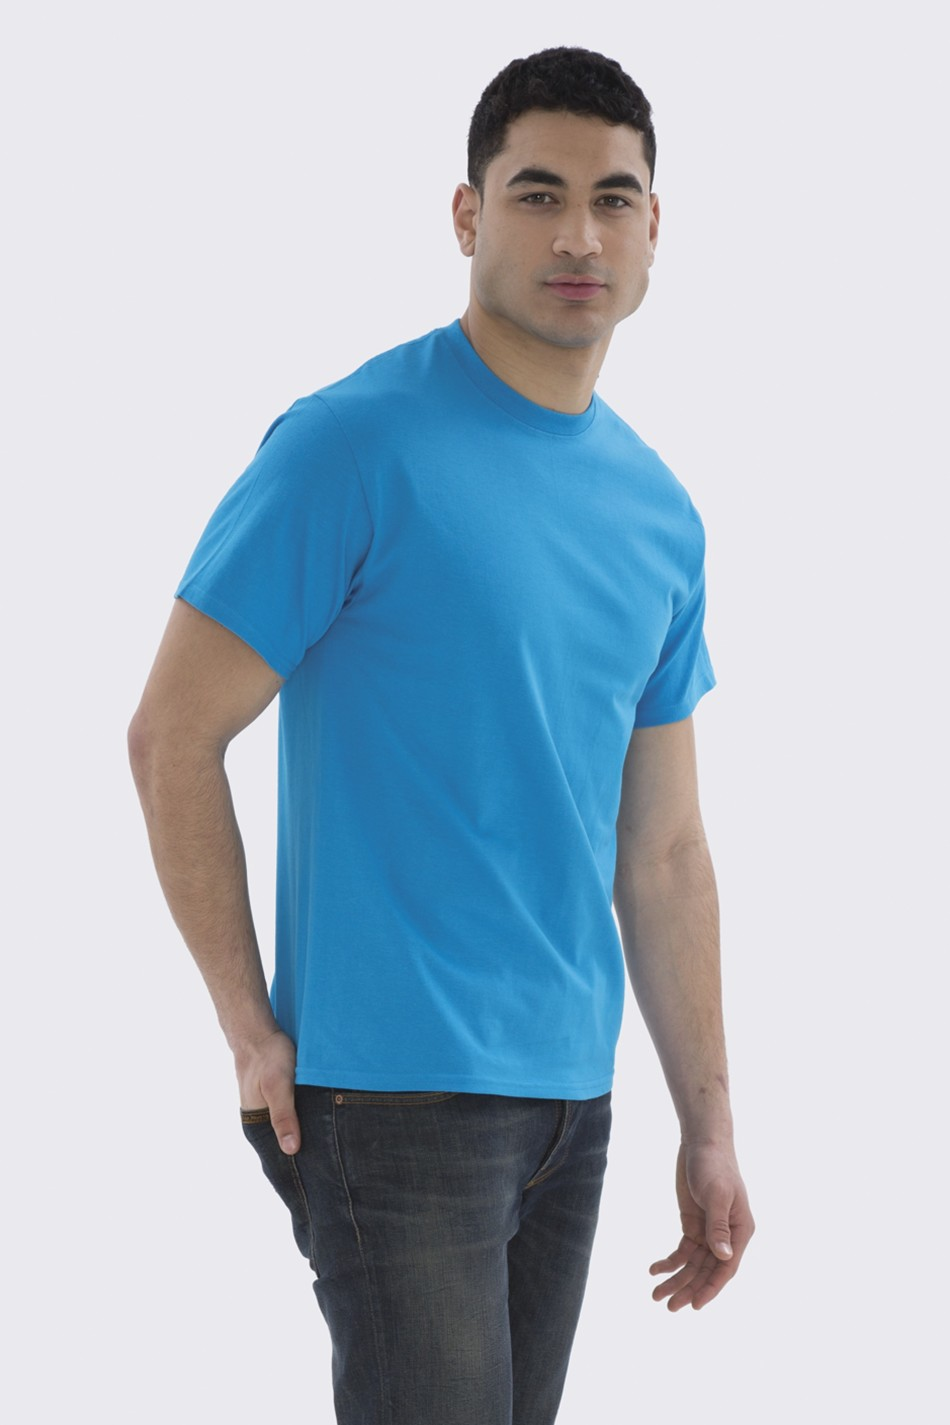 T Shirt Printing Company North Vancouver